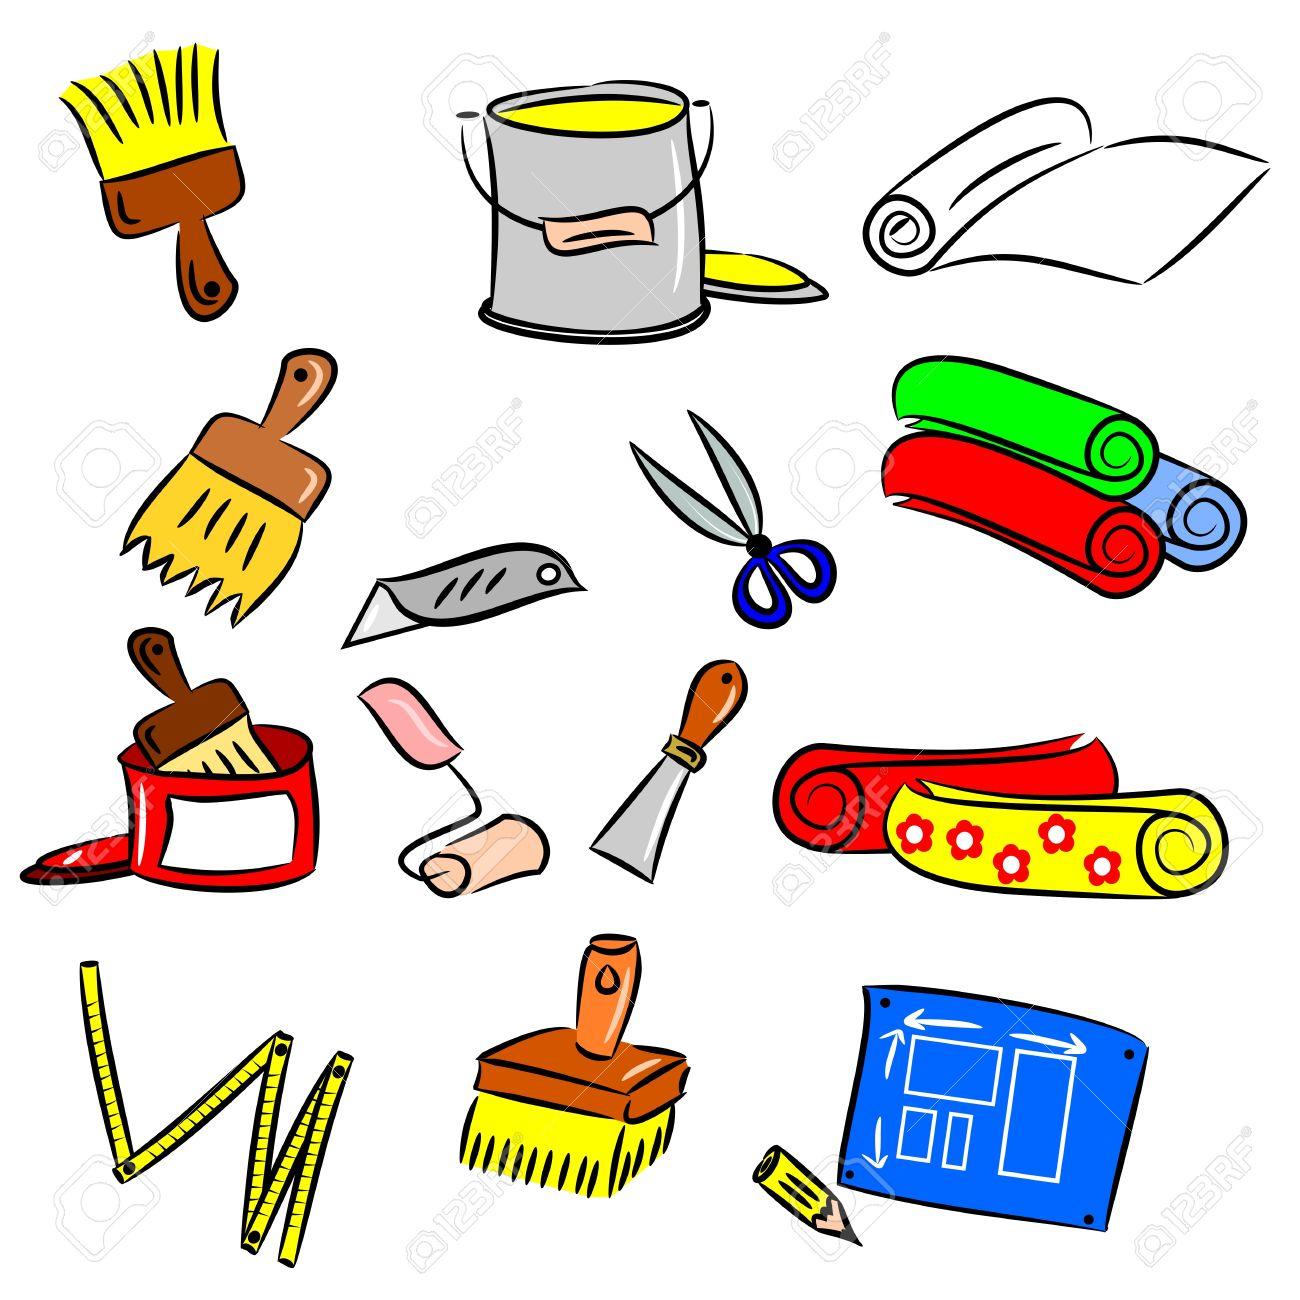 cartoon drawings of DIY tools for decorating and renovating Stock Vector - 15875326